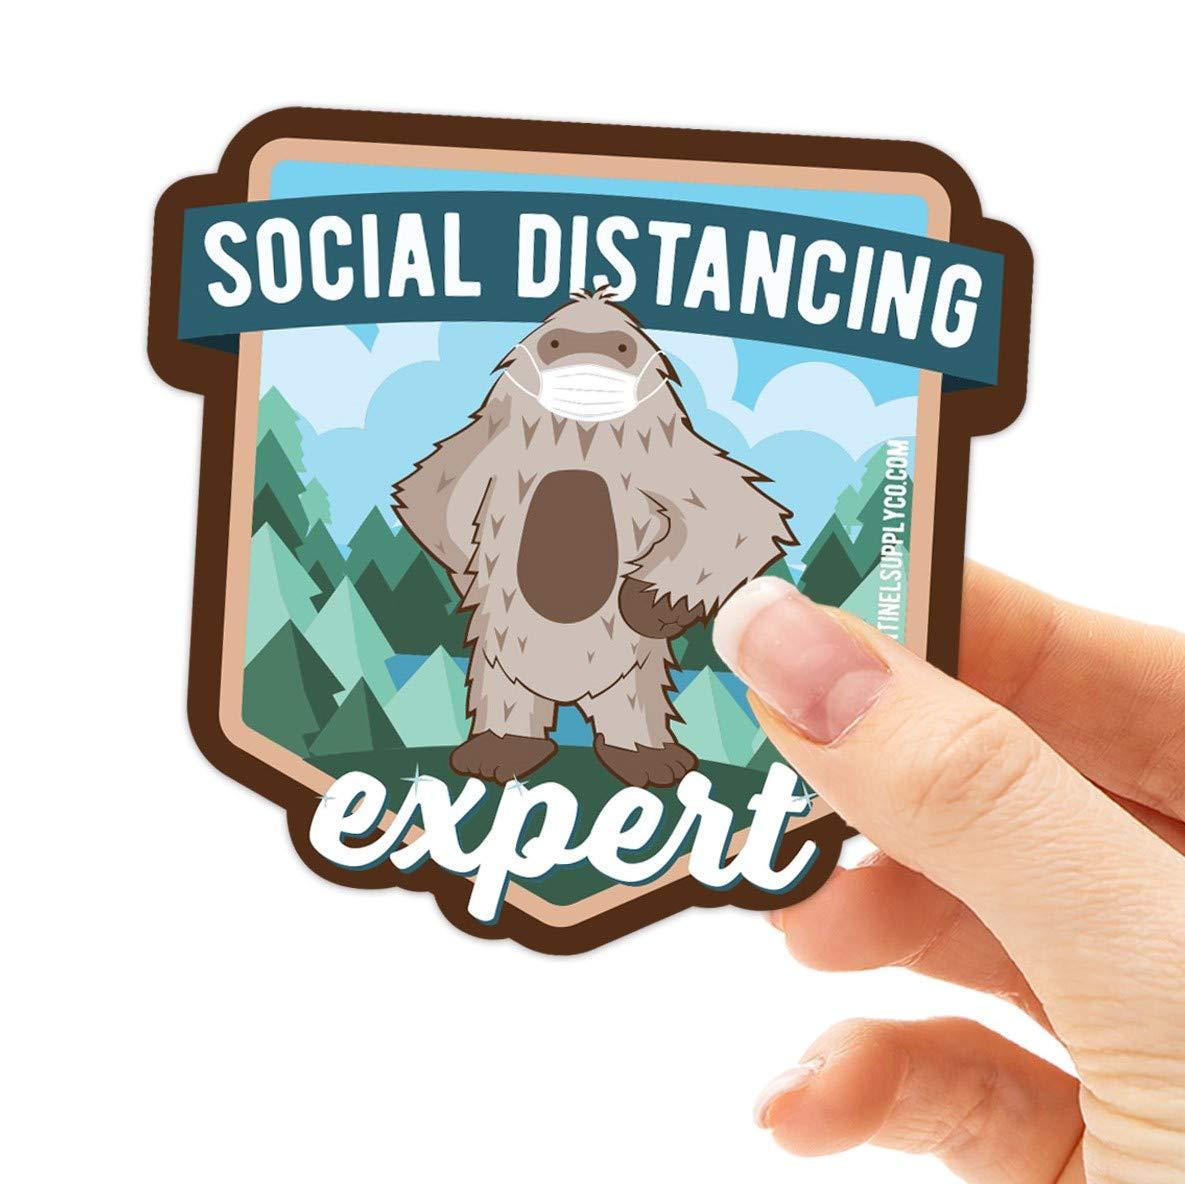 Social Distancing Bigfoot | Sasquatch Sticker for Hydroflask Sticker | Funny Sasquatch Expert Decal